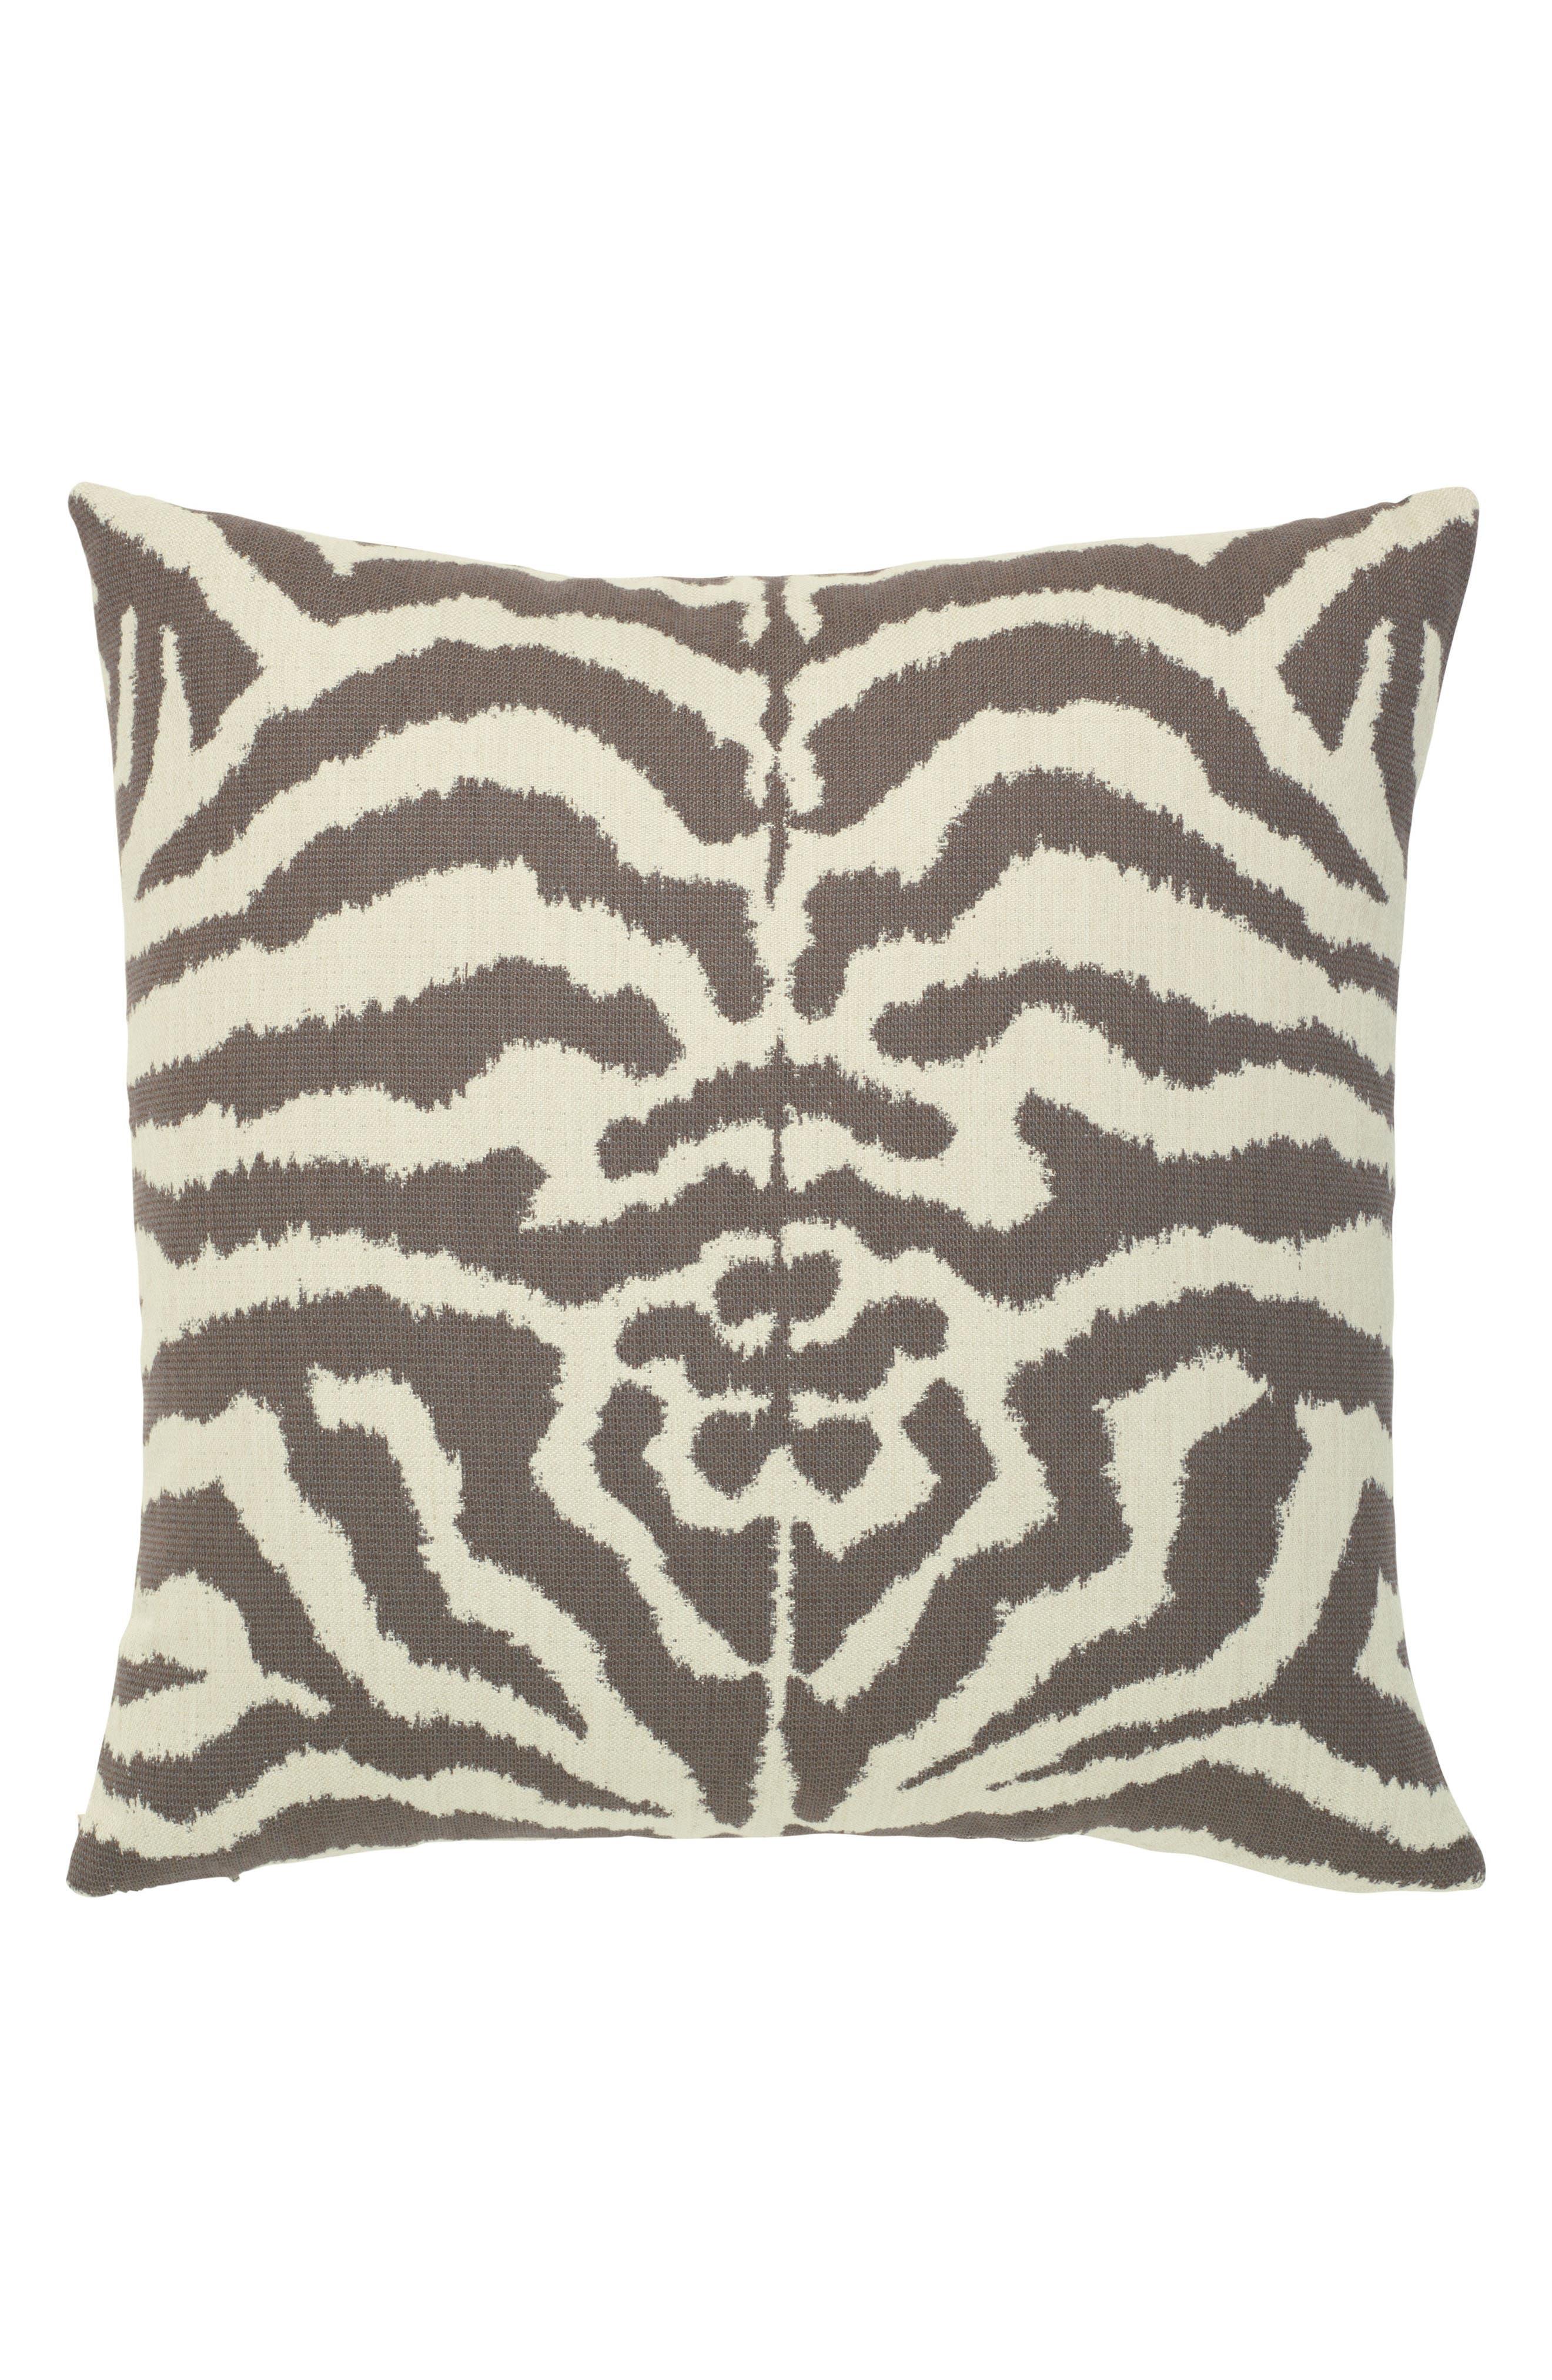 Zebra Mocha Indoor/Outdoor Accent Pillow,                         Main,                         color, Brown/ White